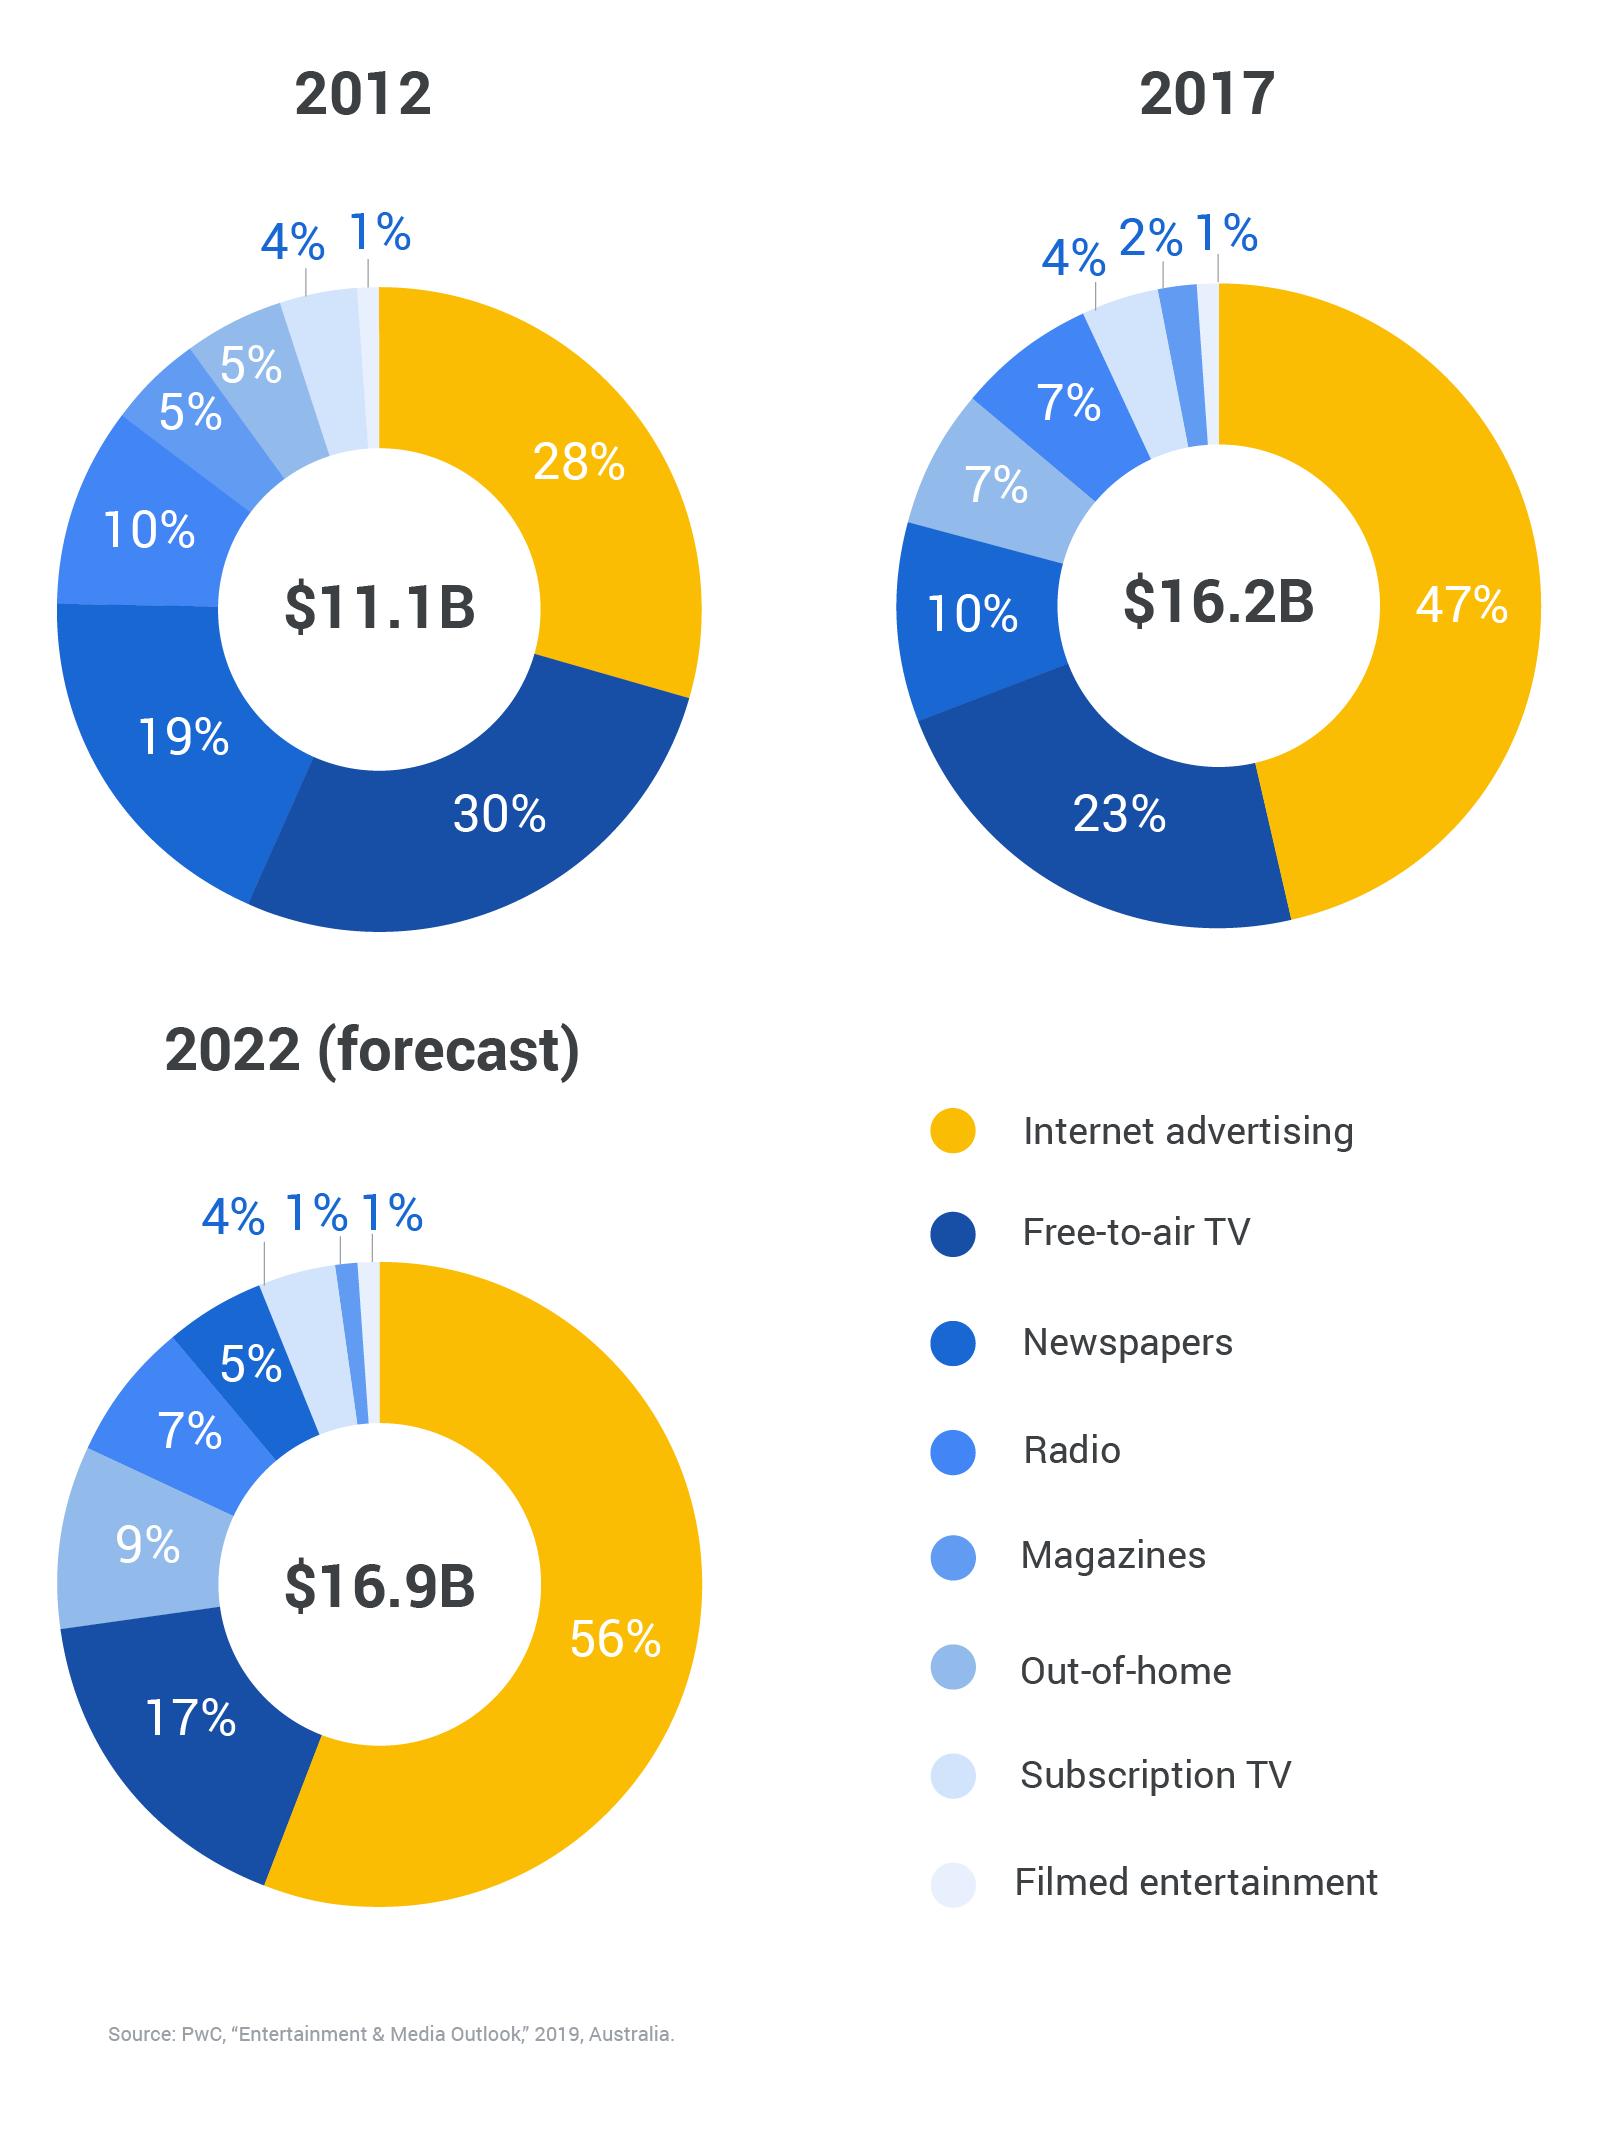 Australia Entertainment & Media outlook 2018-2022, source: thinkwithgoogle.com 2019 | DEANLONG.io